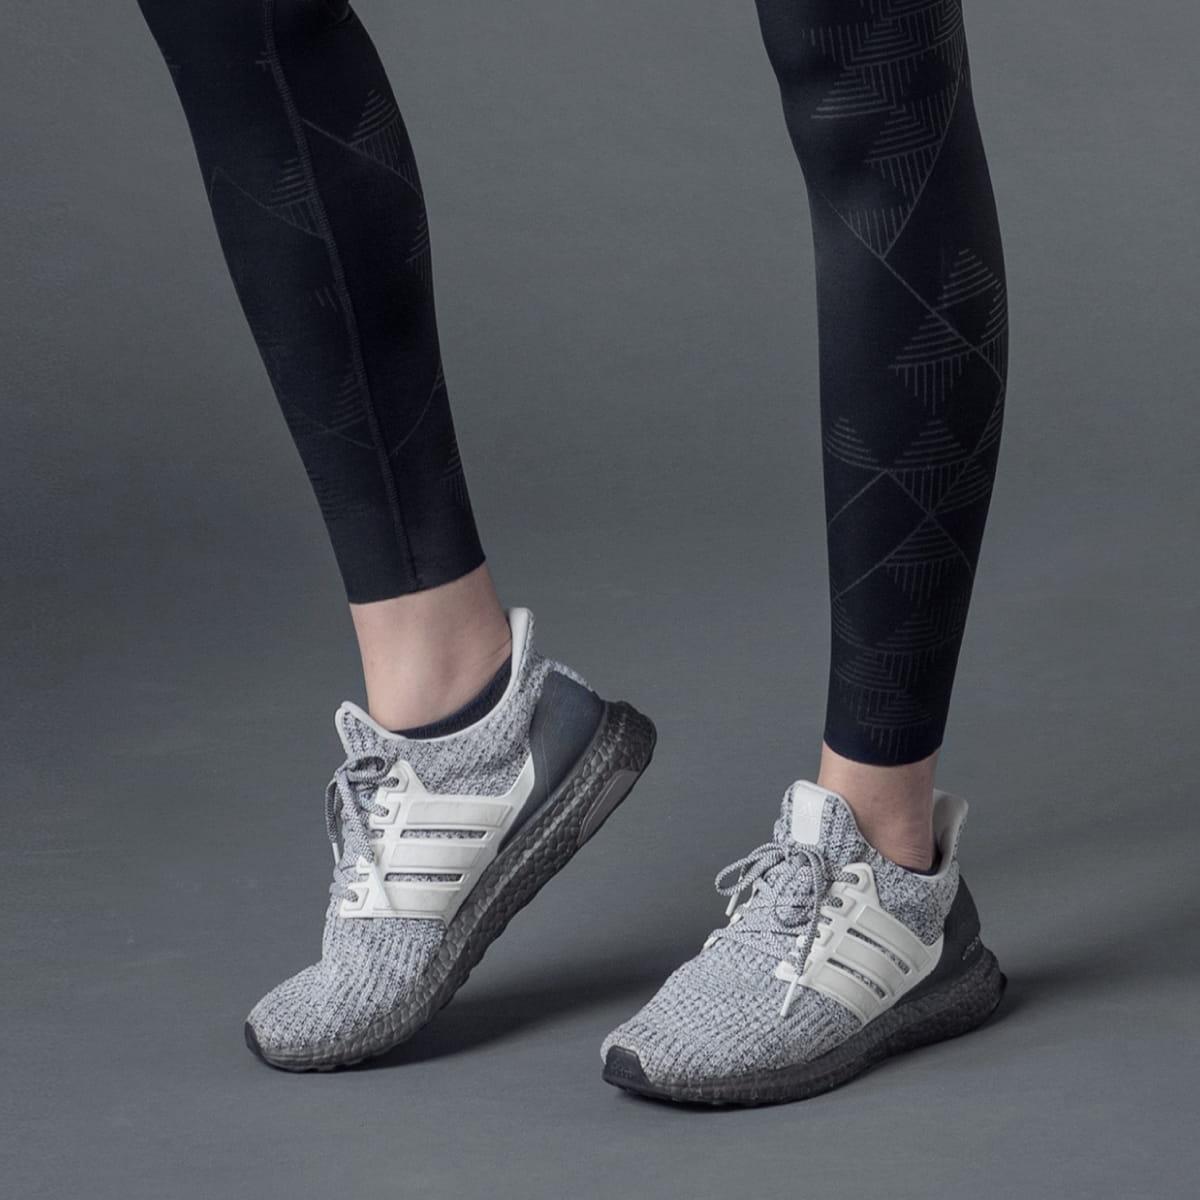 TENO超彈感美型健身褲-Mountain山稜 14